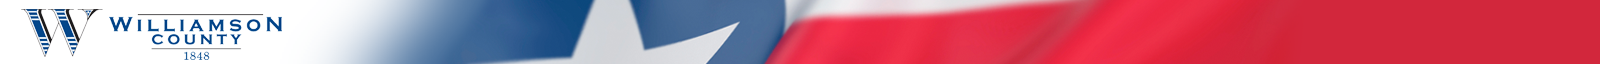 Williamson County, TX logo